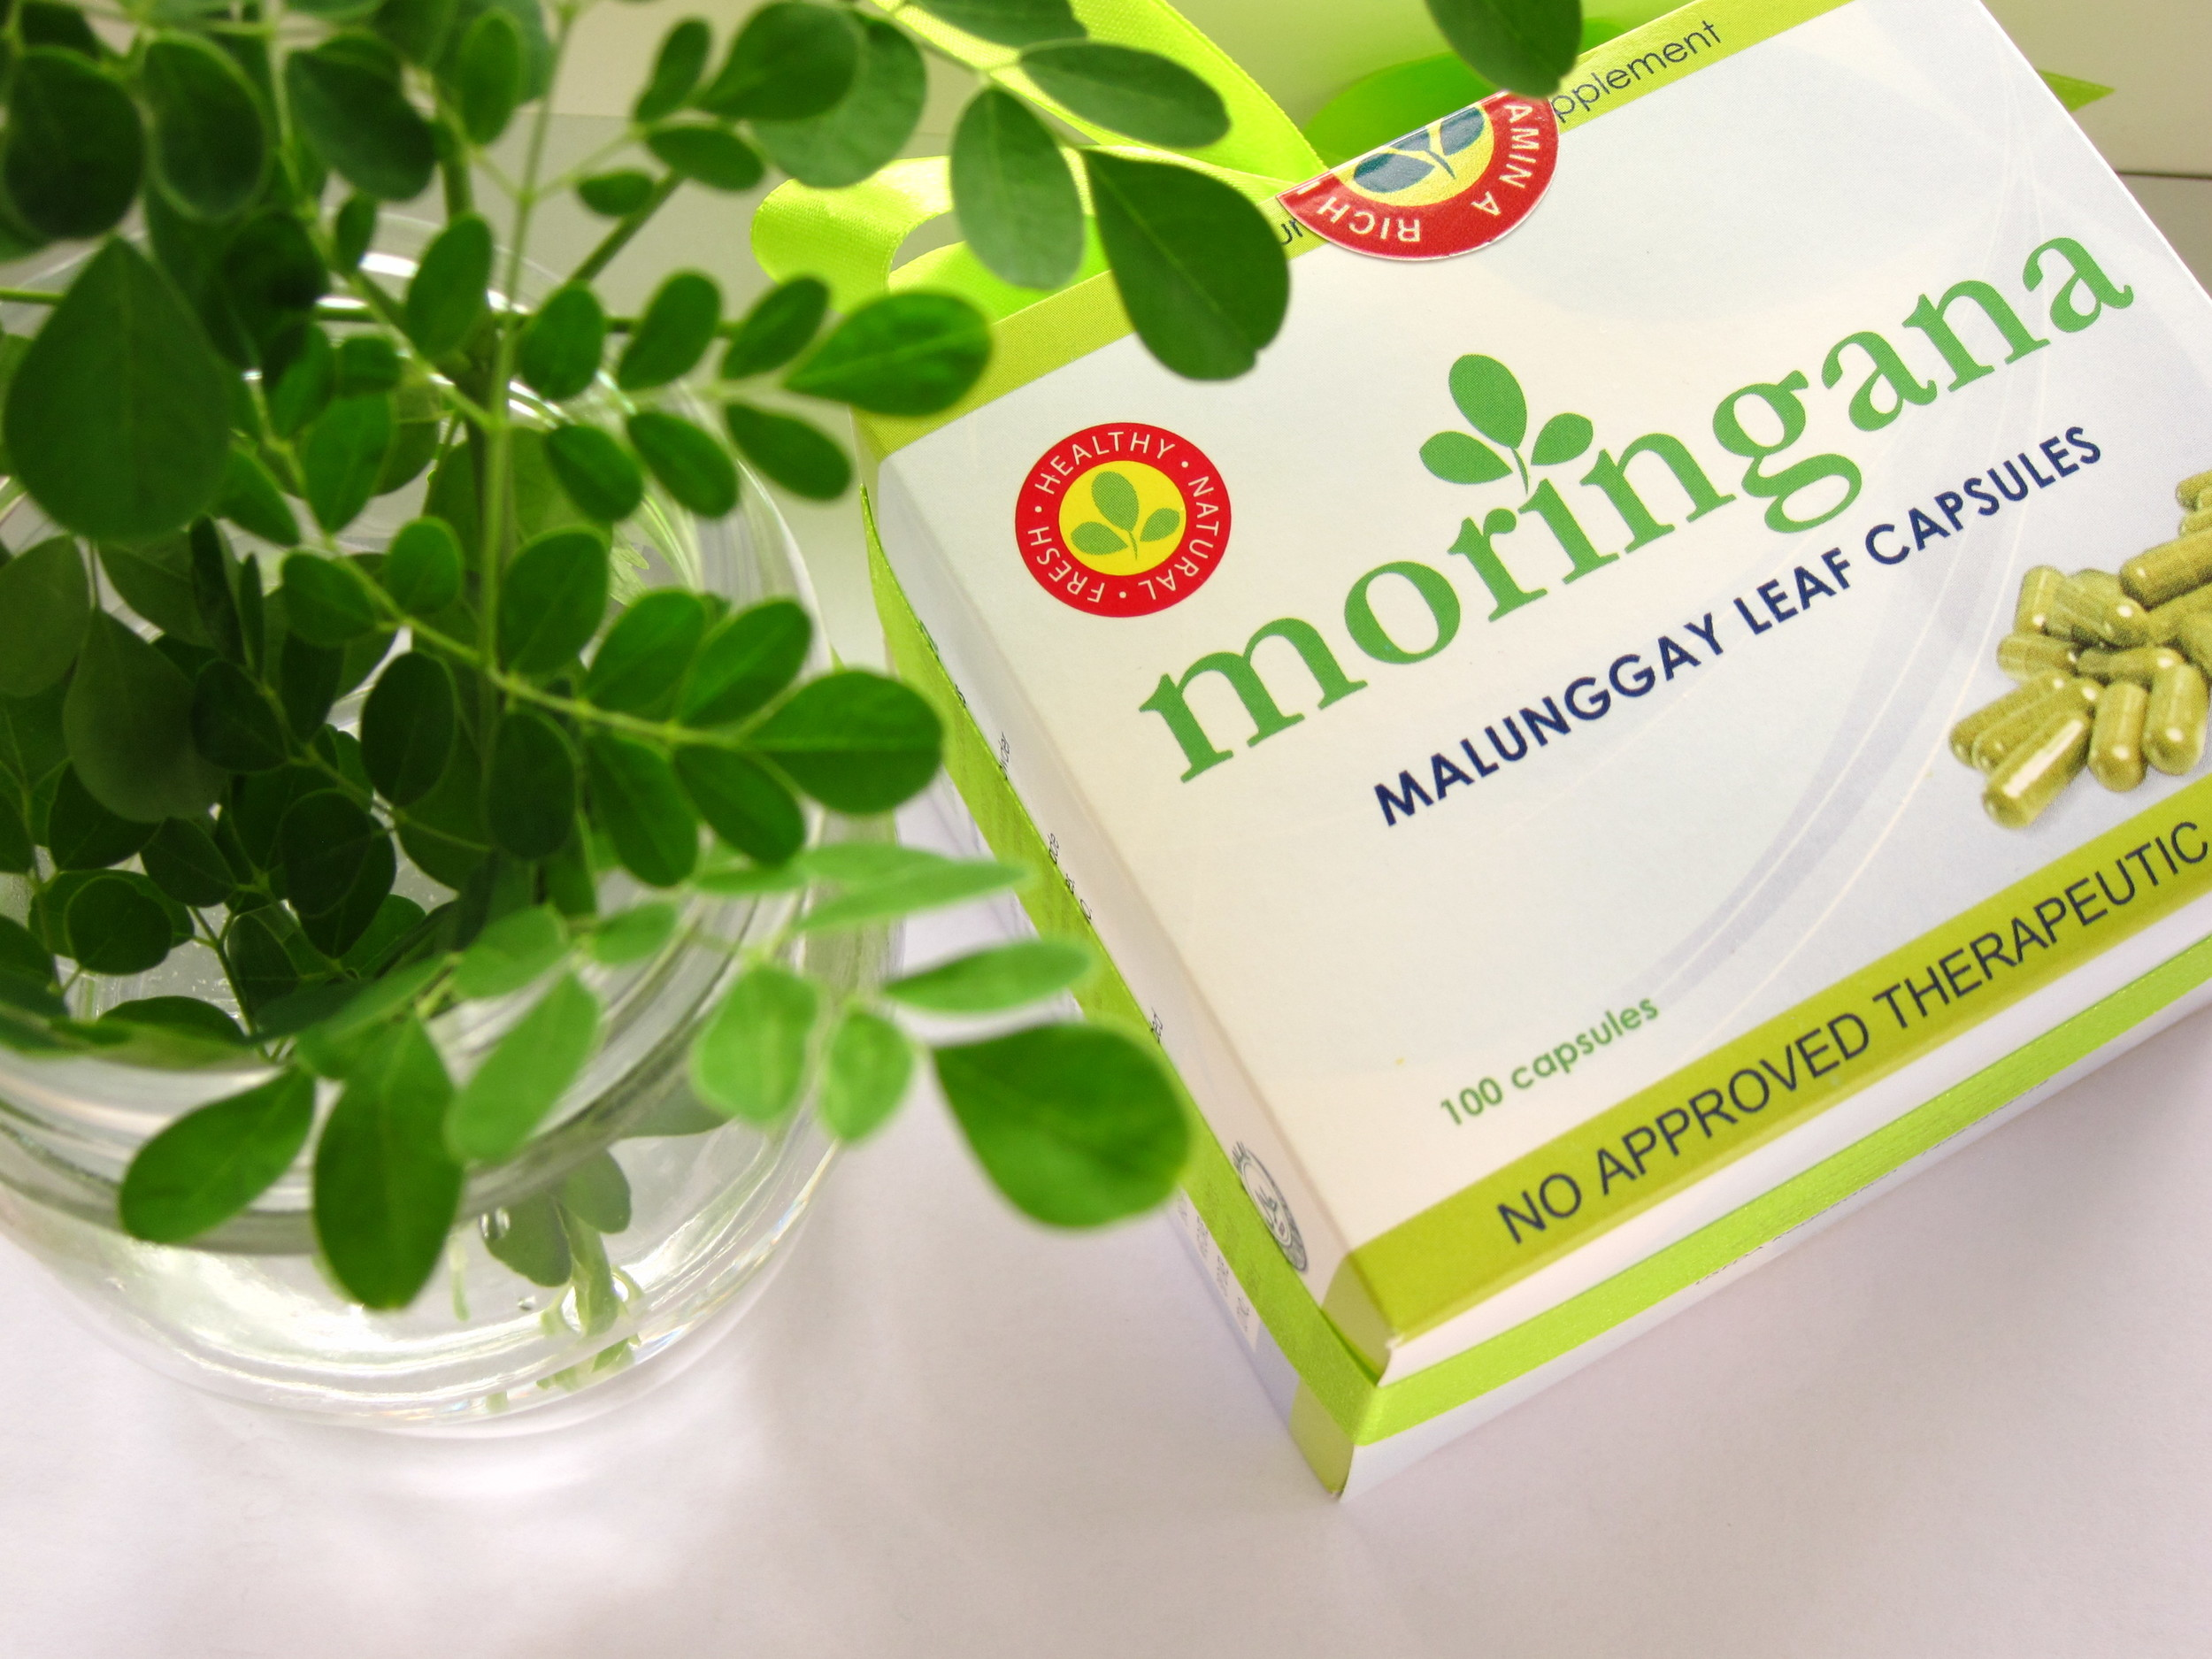 Moringana-box-Malunggay-Moringa